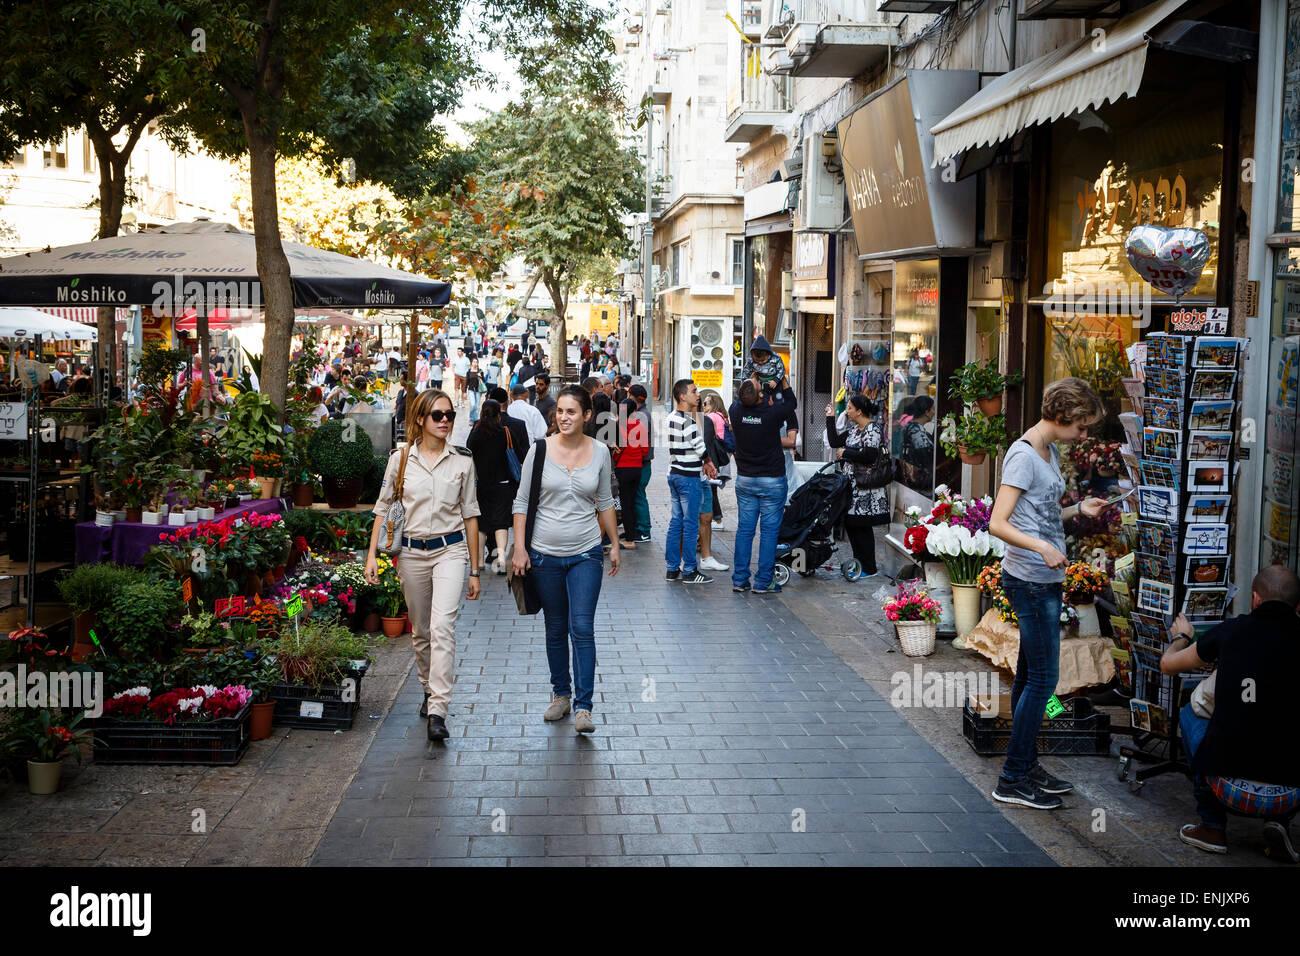 Calle peatonal Ben Yehuda, en Jerusalén, Israel, Oriente Medio Imagen De Stock